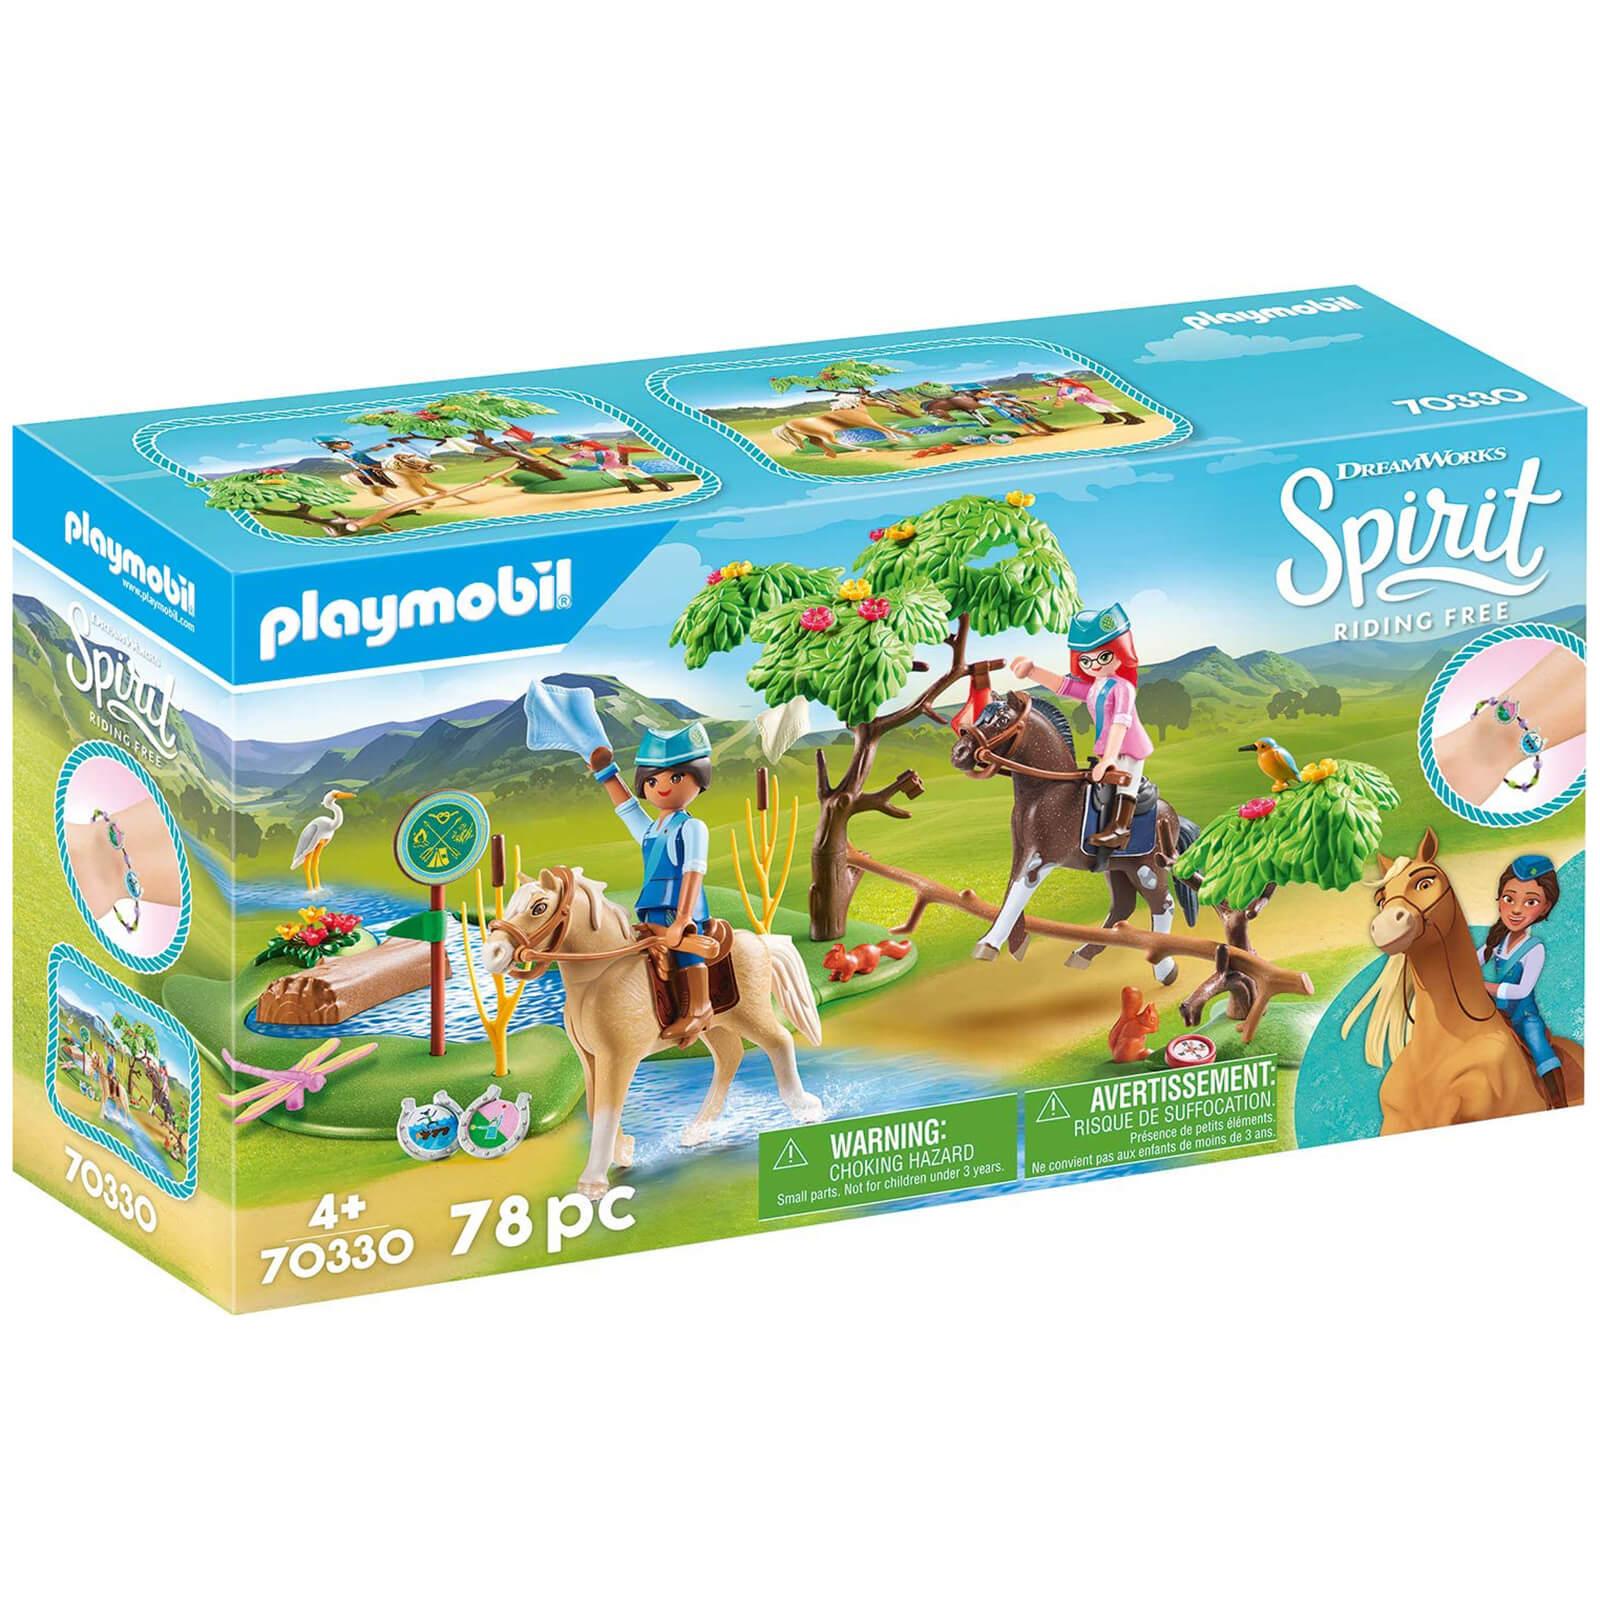 Image of Playmobil DreamWorks Spirit Outdoor Adventure (70330)